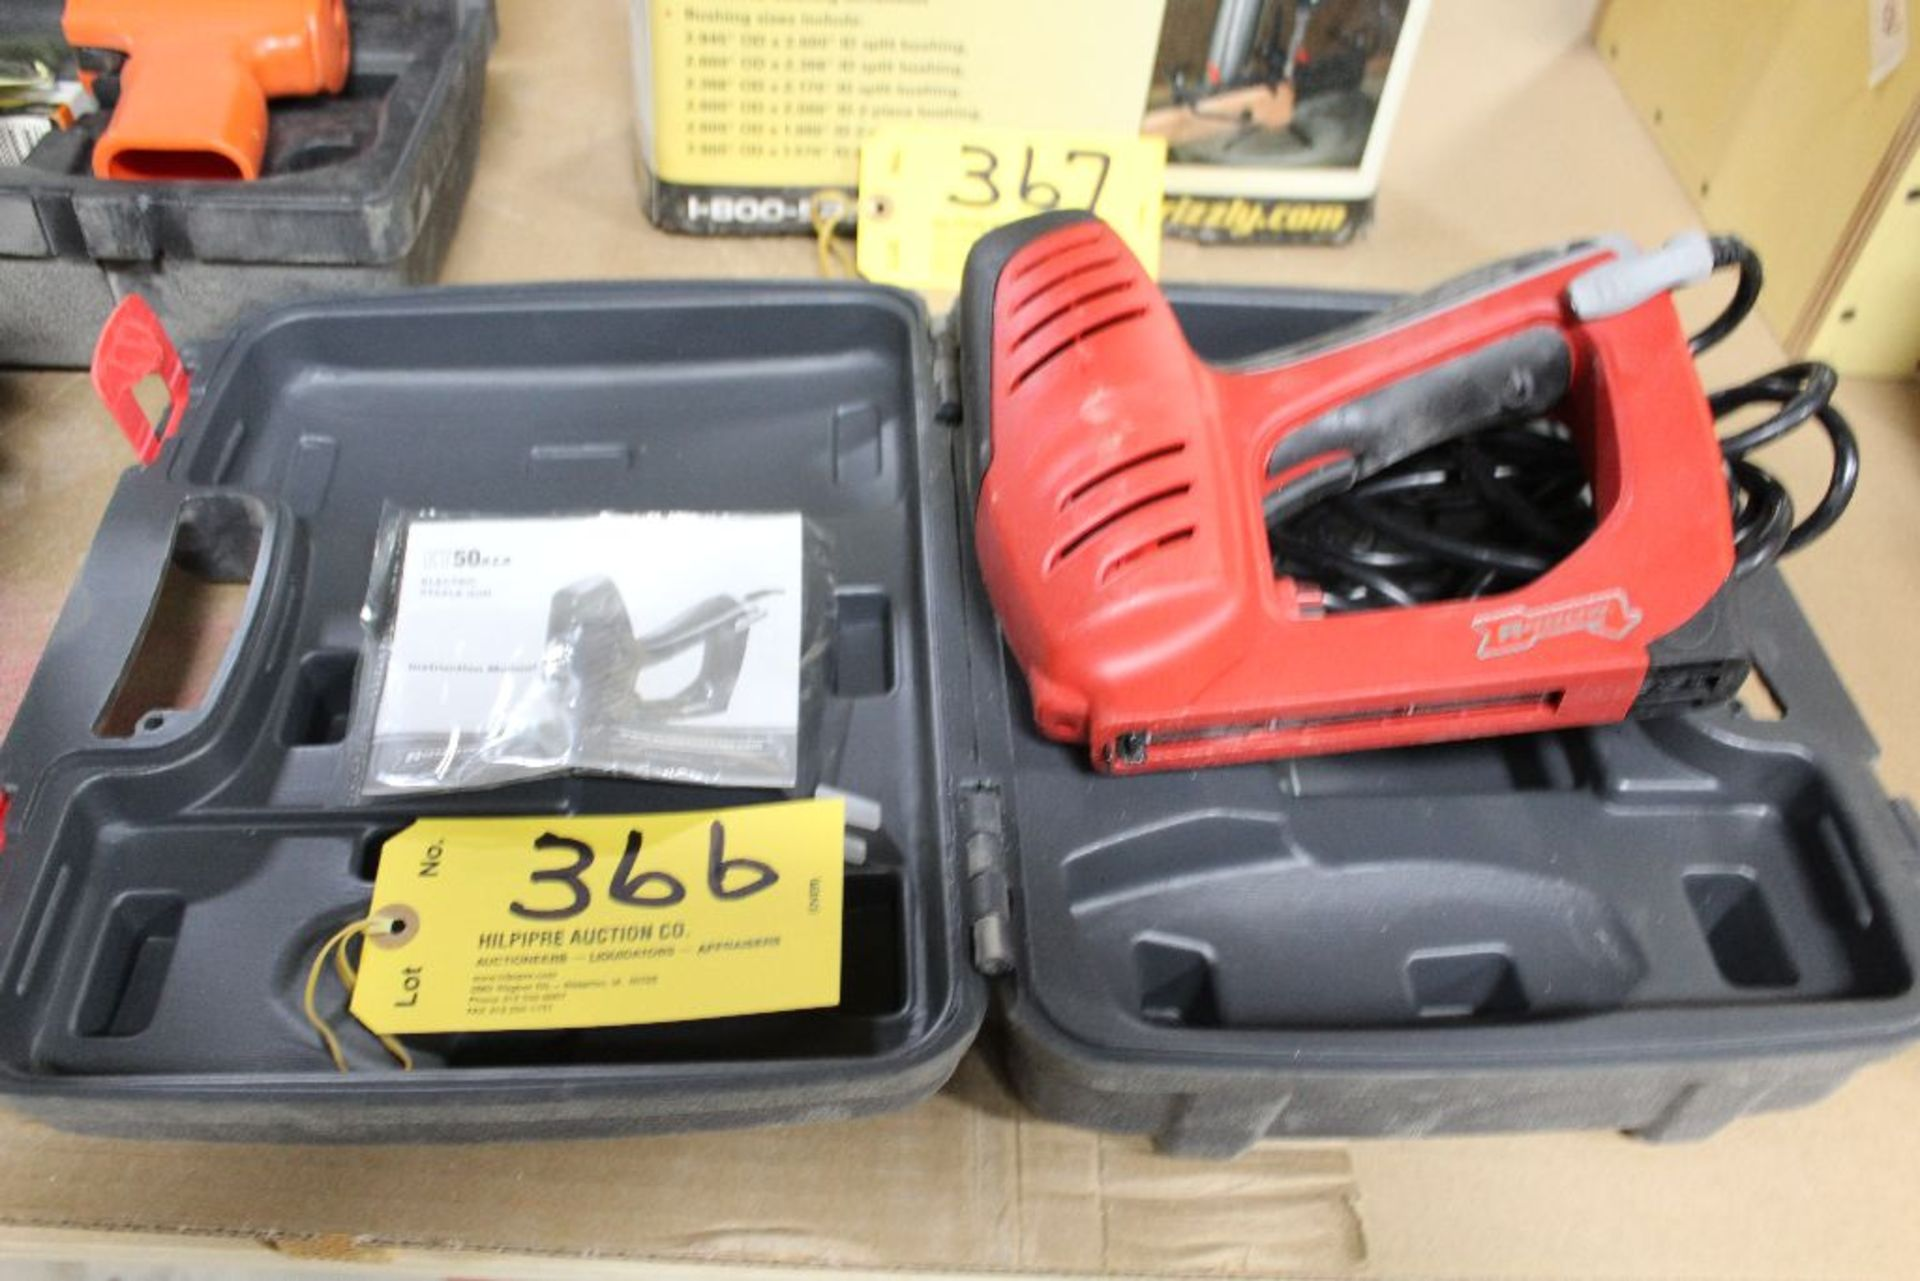 Lot 366 - Arrow electric stapler